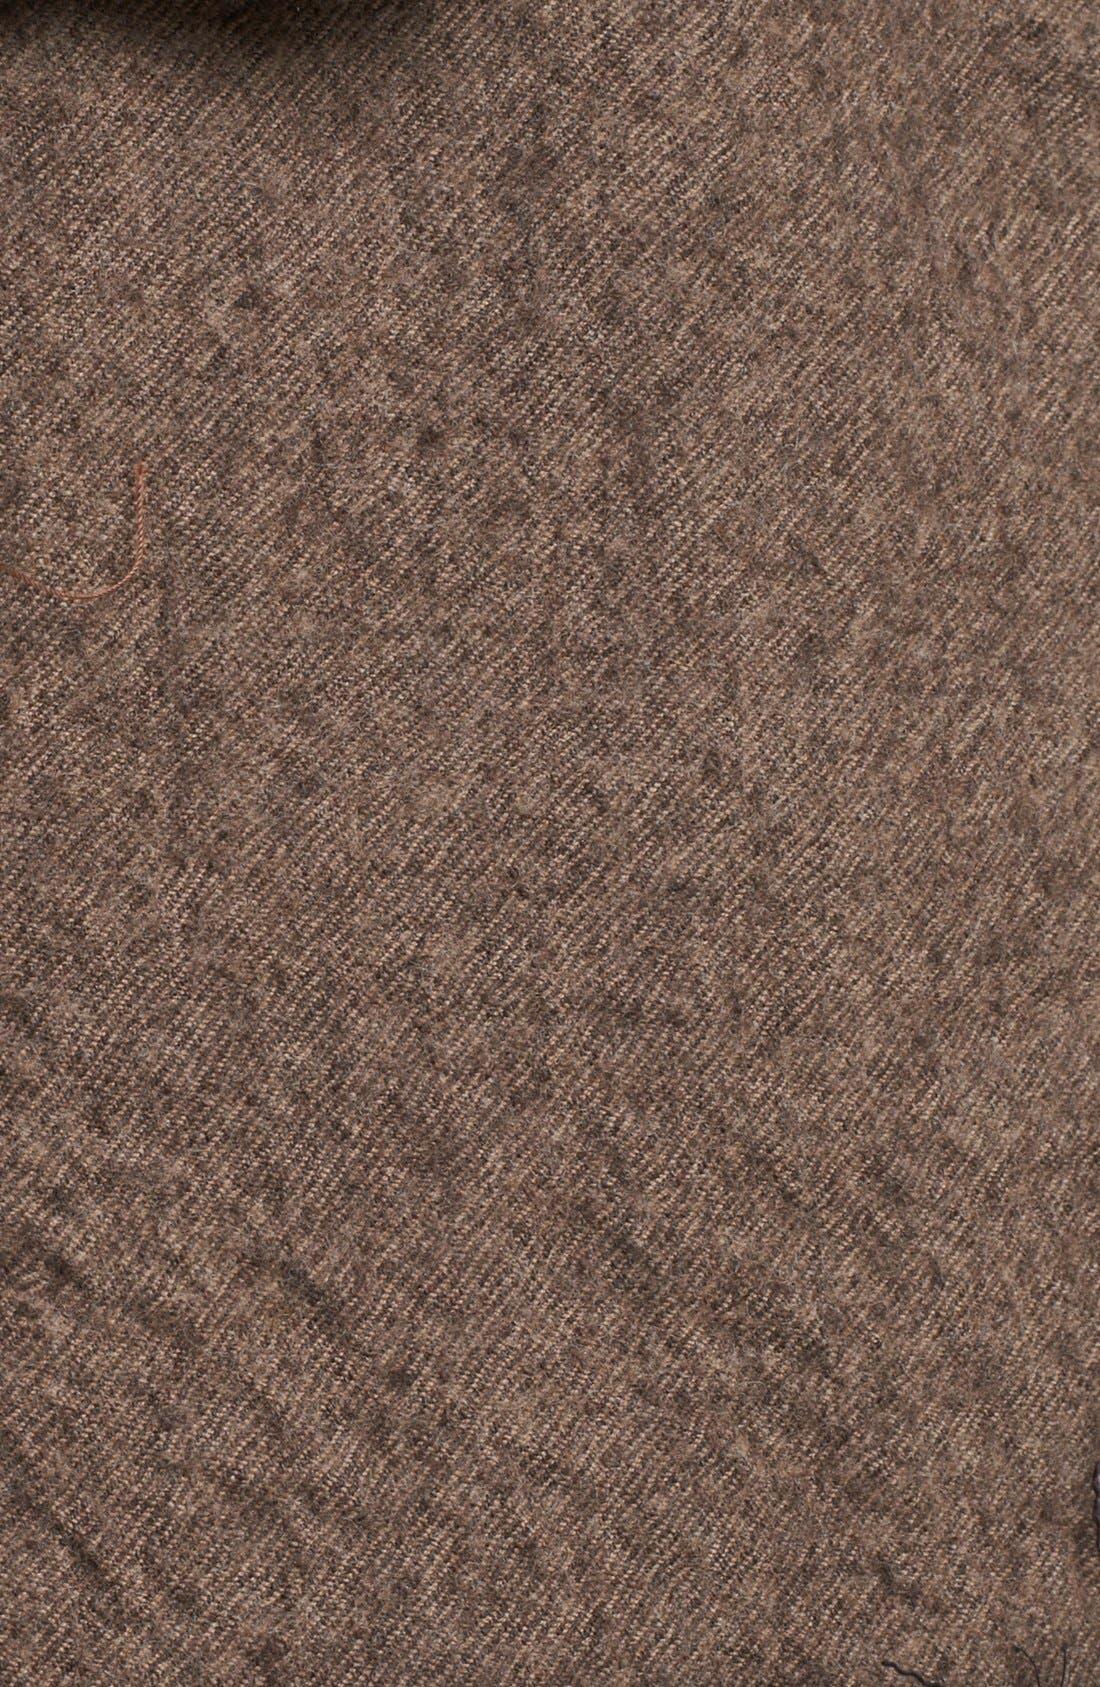 Alternate Image 3  - Junya Watanabe Patchwork Wool Overcoat